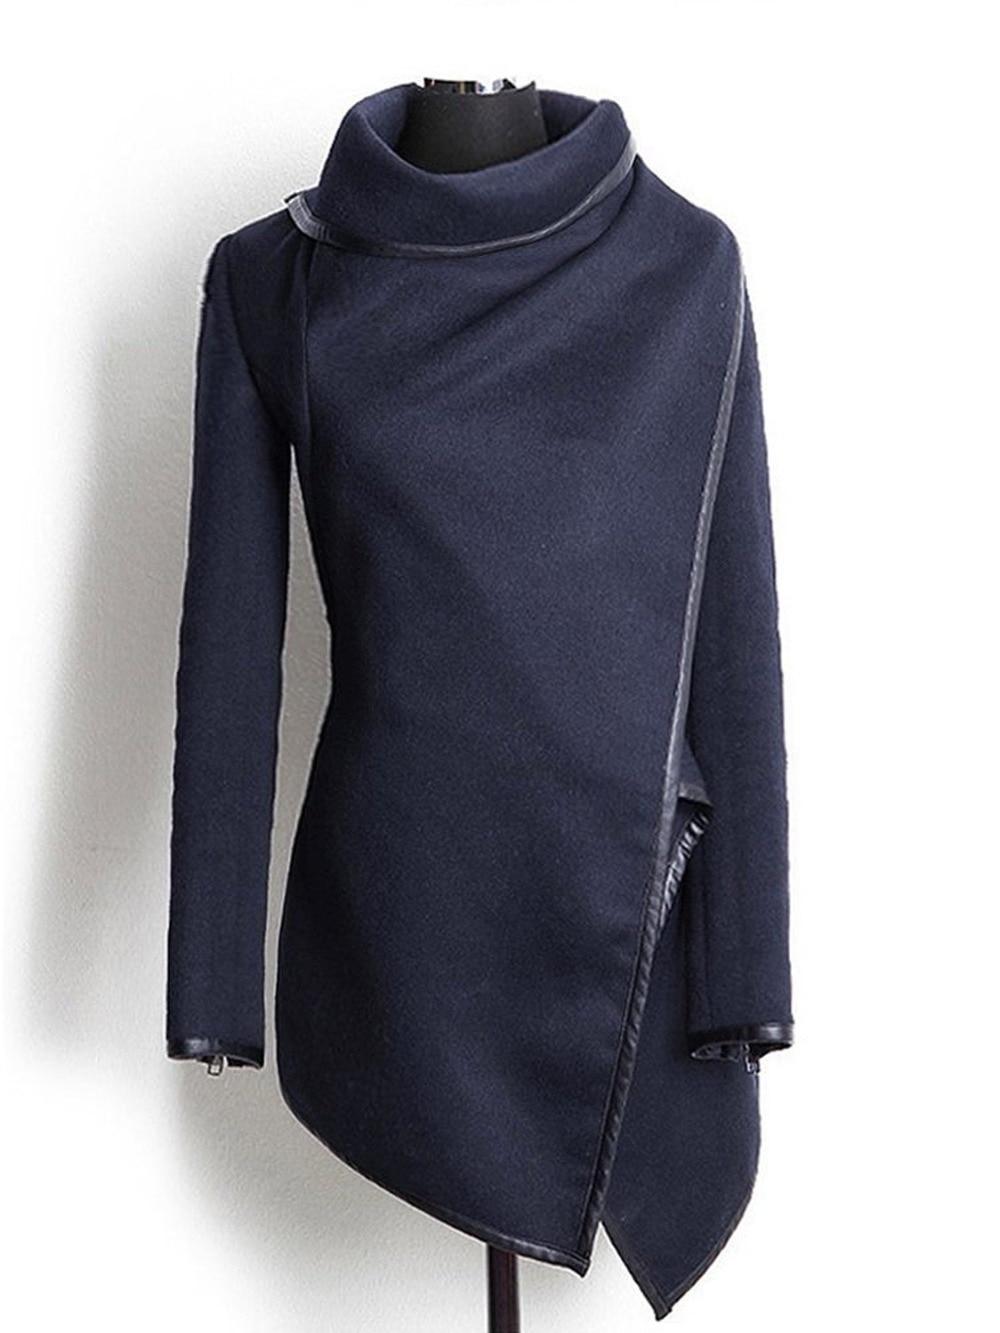 Online Get Cheap Trench Coat Women Sale -Aliexpress.com | Alibaba